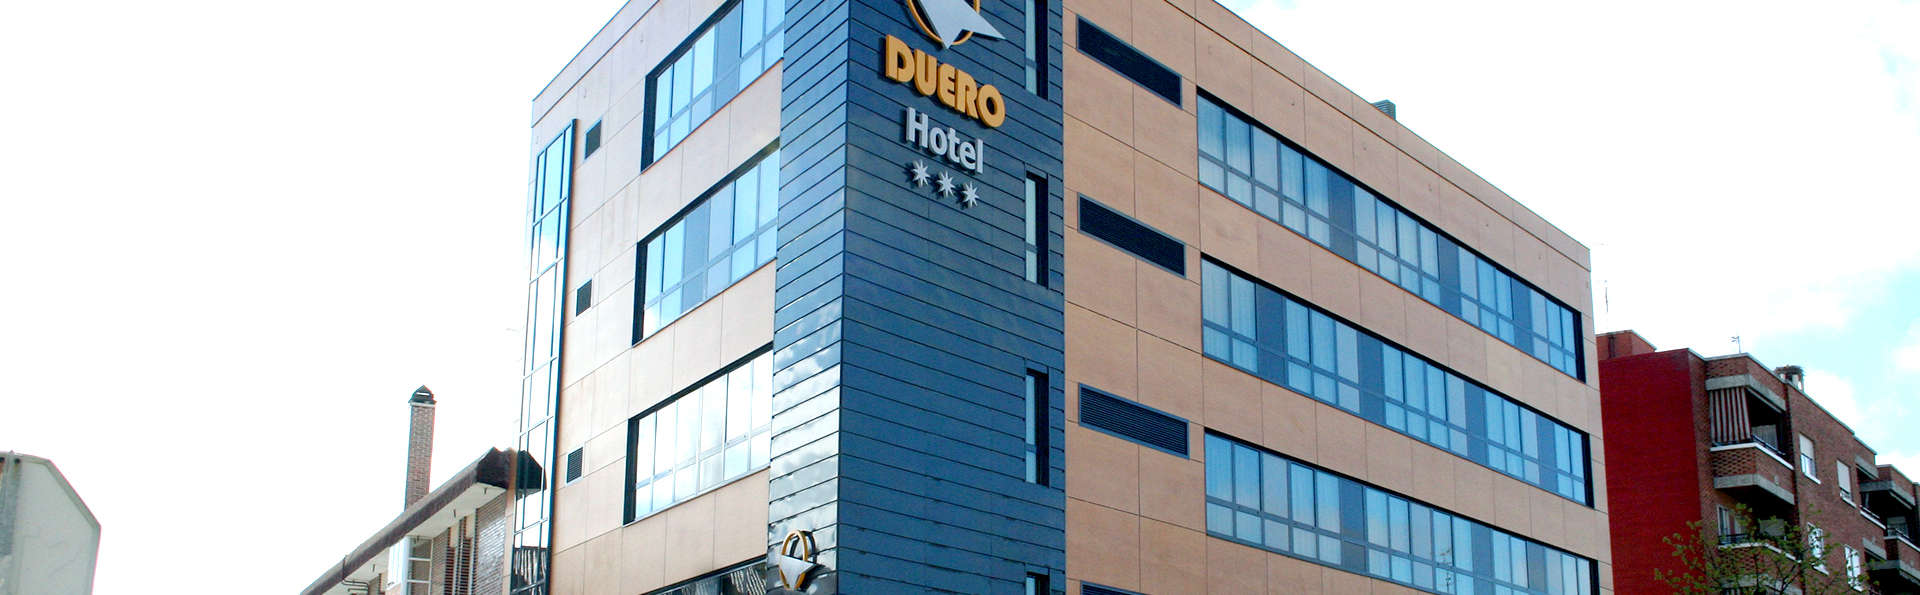 Hotel Duero  - Edit_Front.jpg